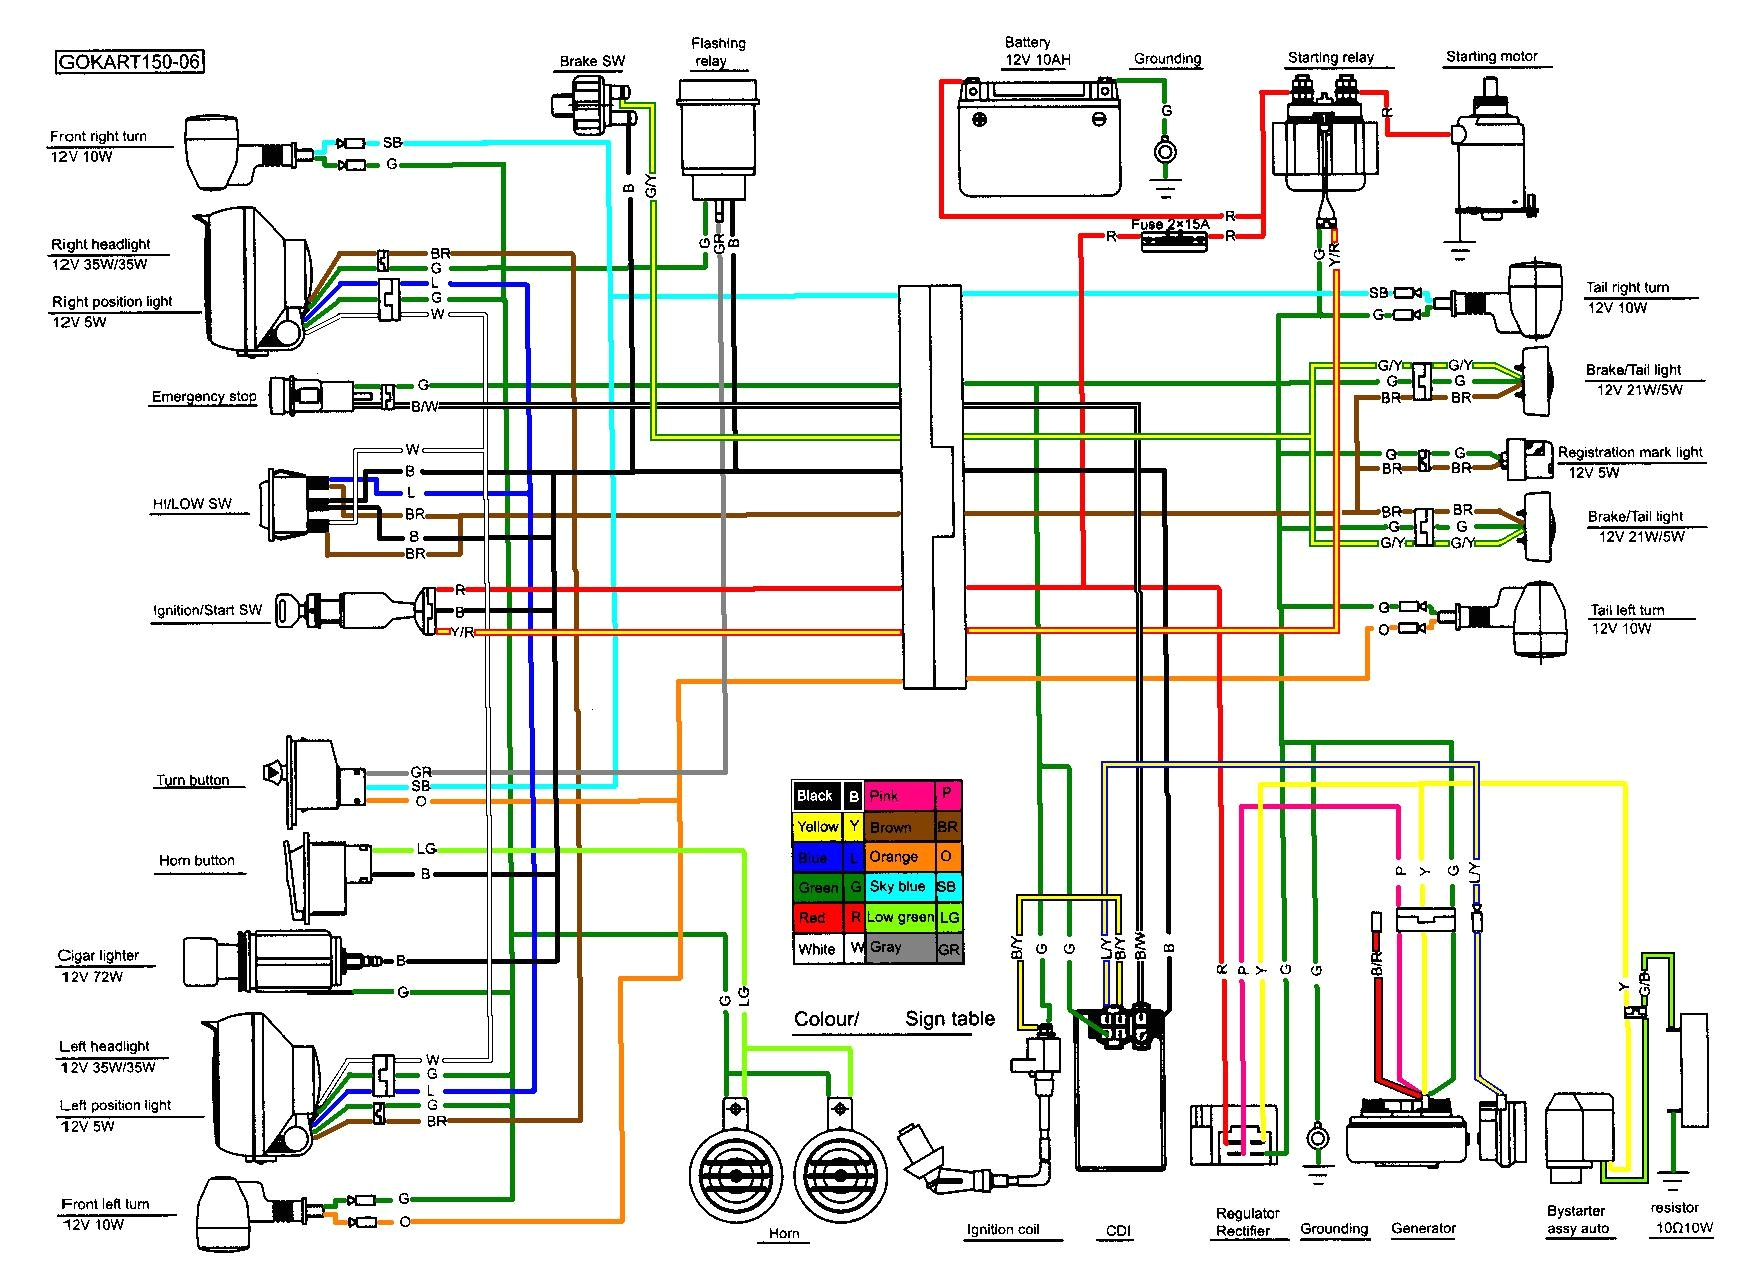 taotao 110cc atv wiring diagram luxury tao tao 125 atv wiring diagram roc grp of taotao 110cc atv wiring diagram jpg